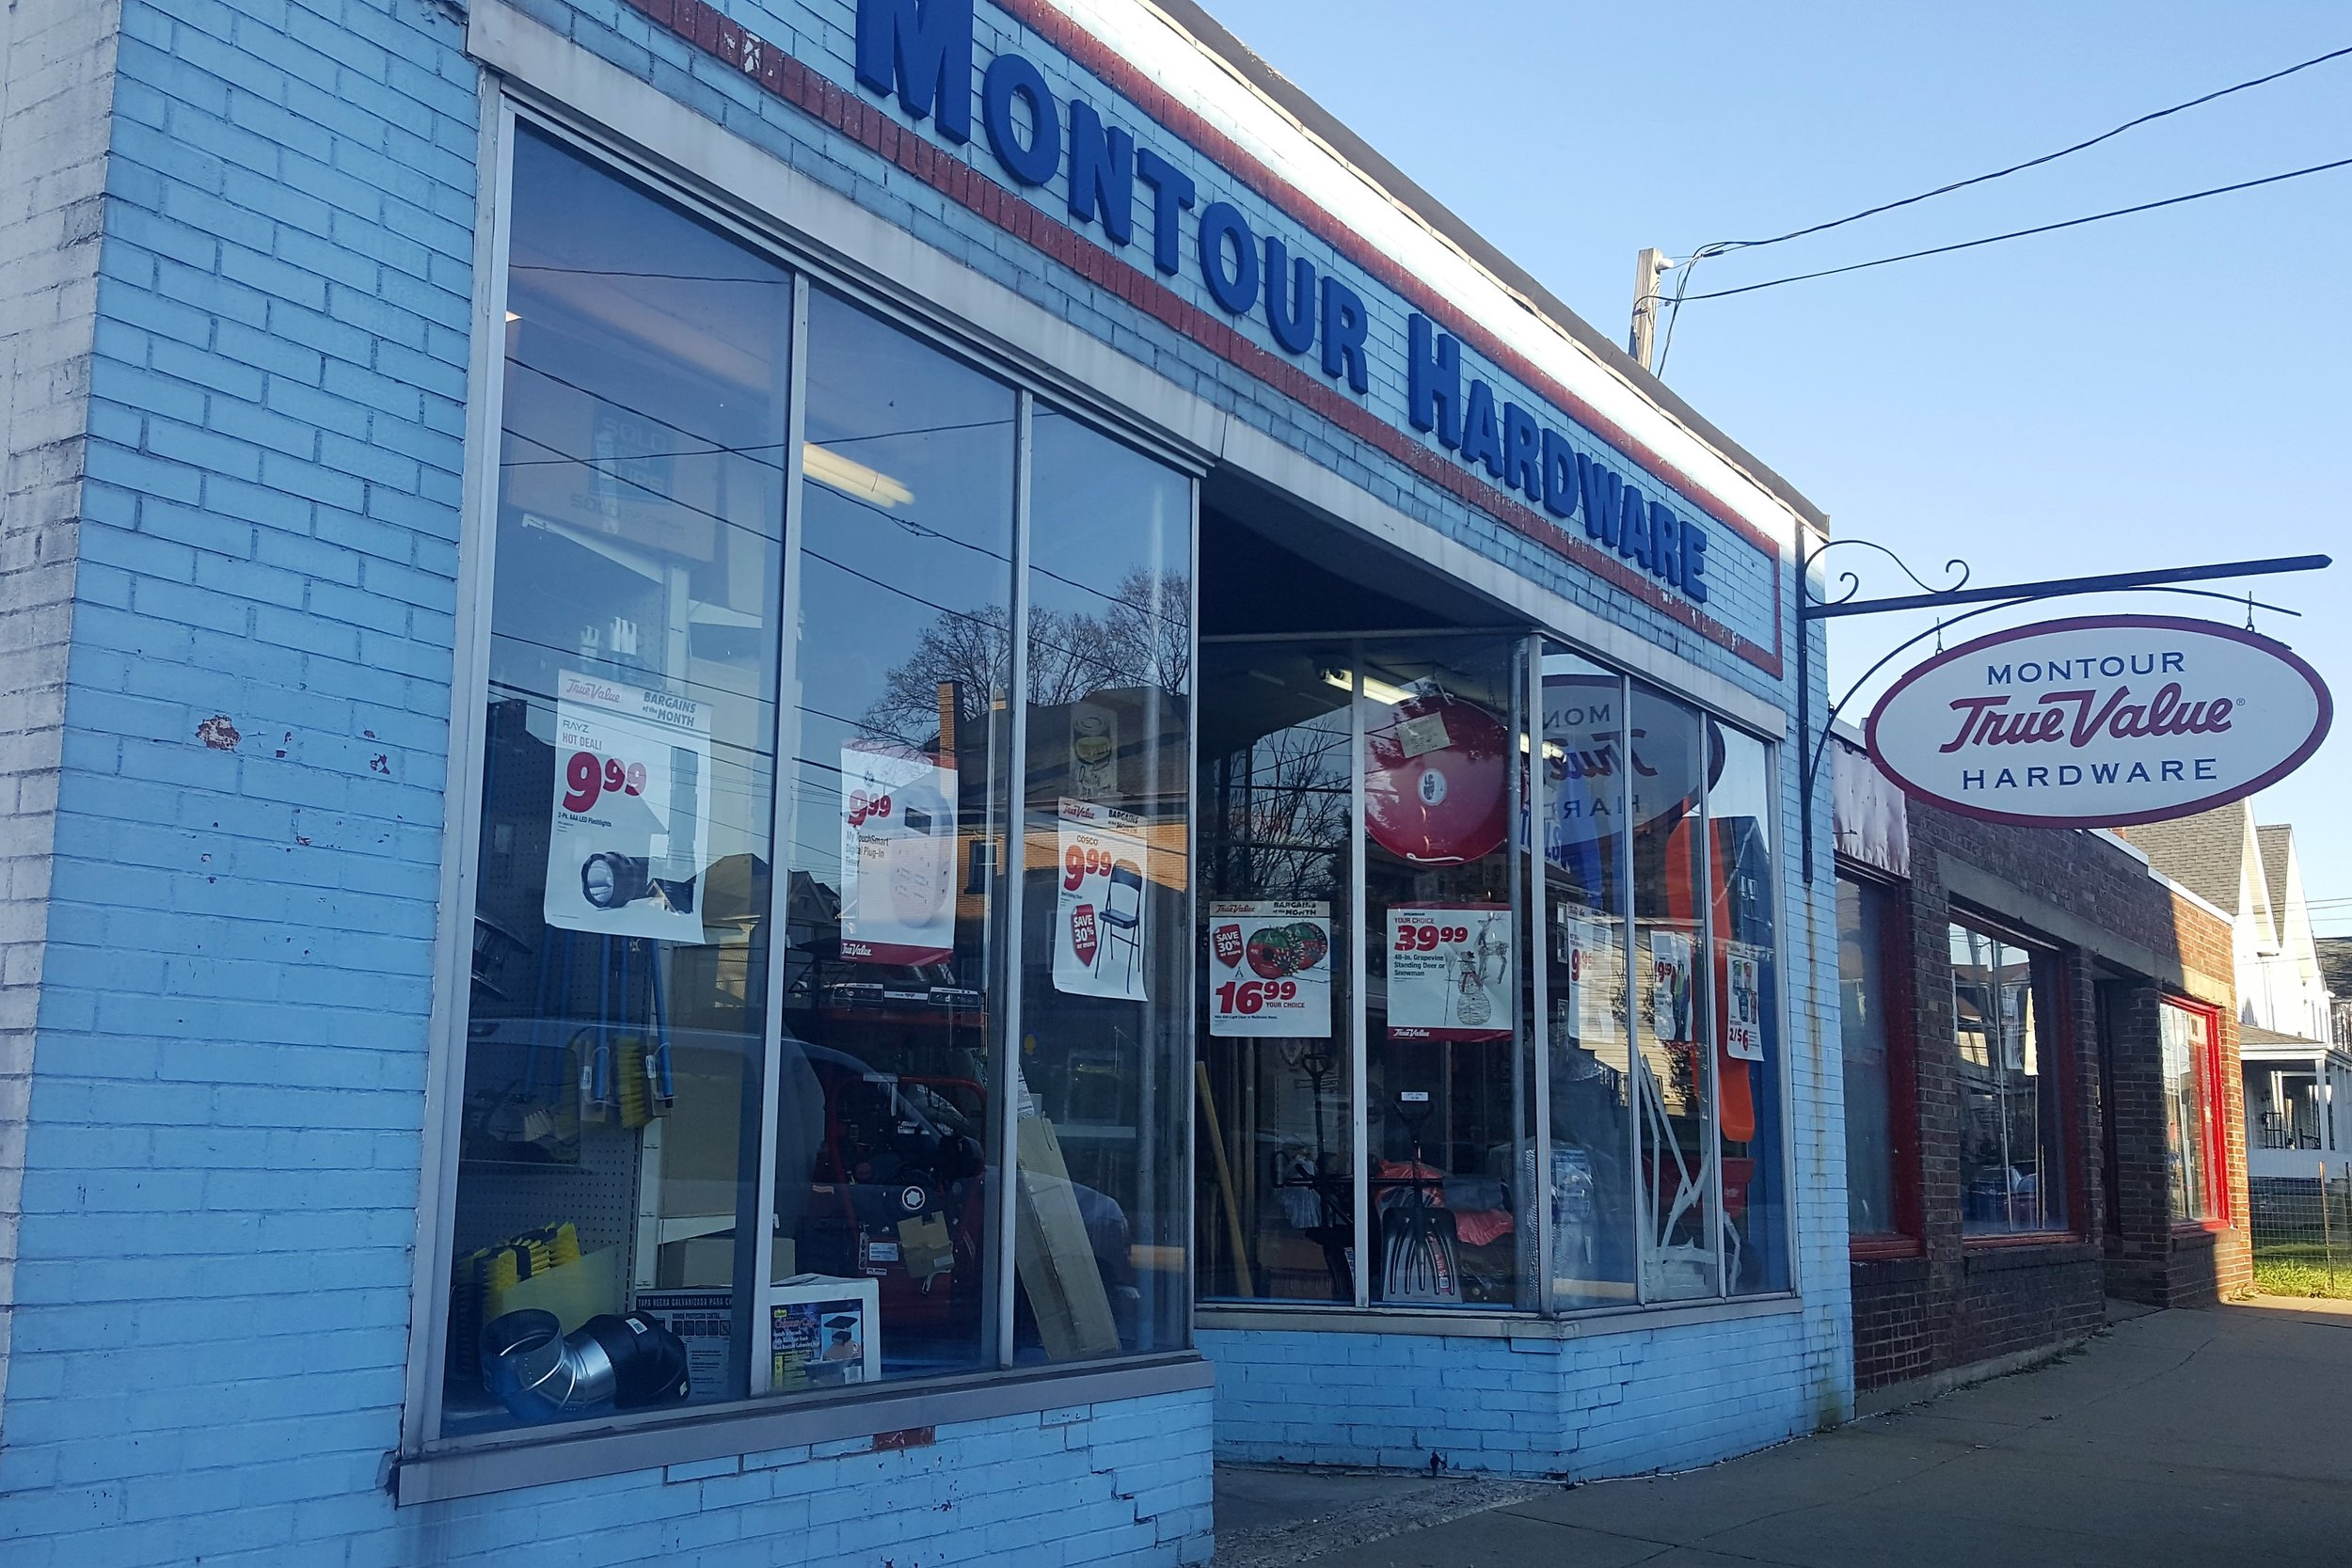 Montour True Value Hardware - 1503 5th Ave, (412) 264-5141